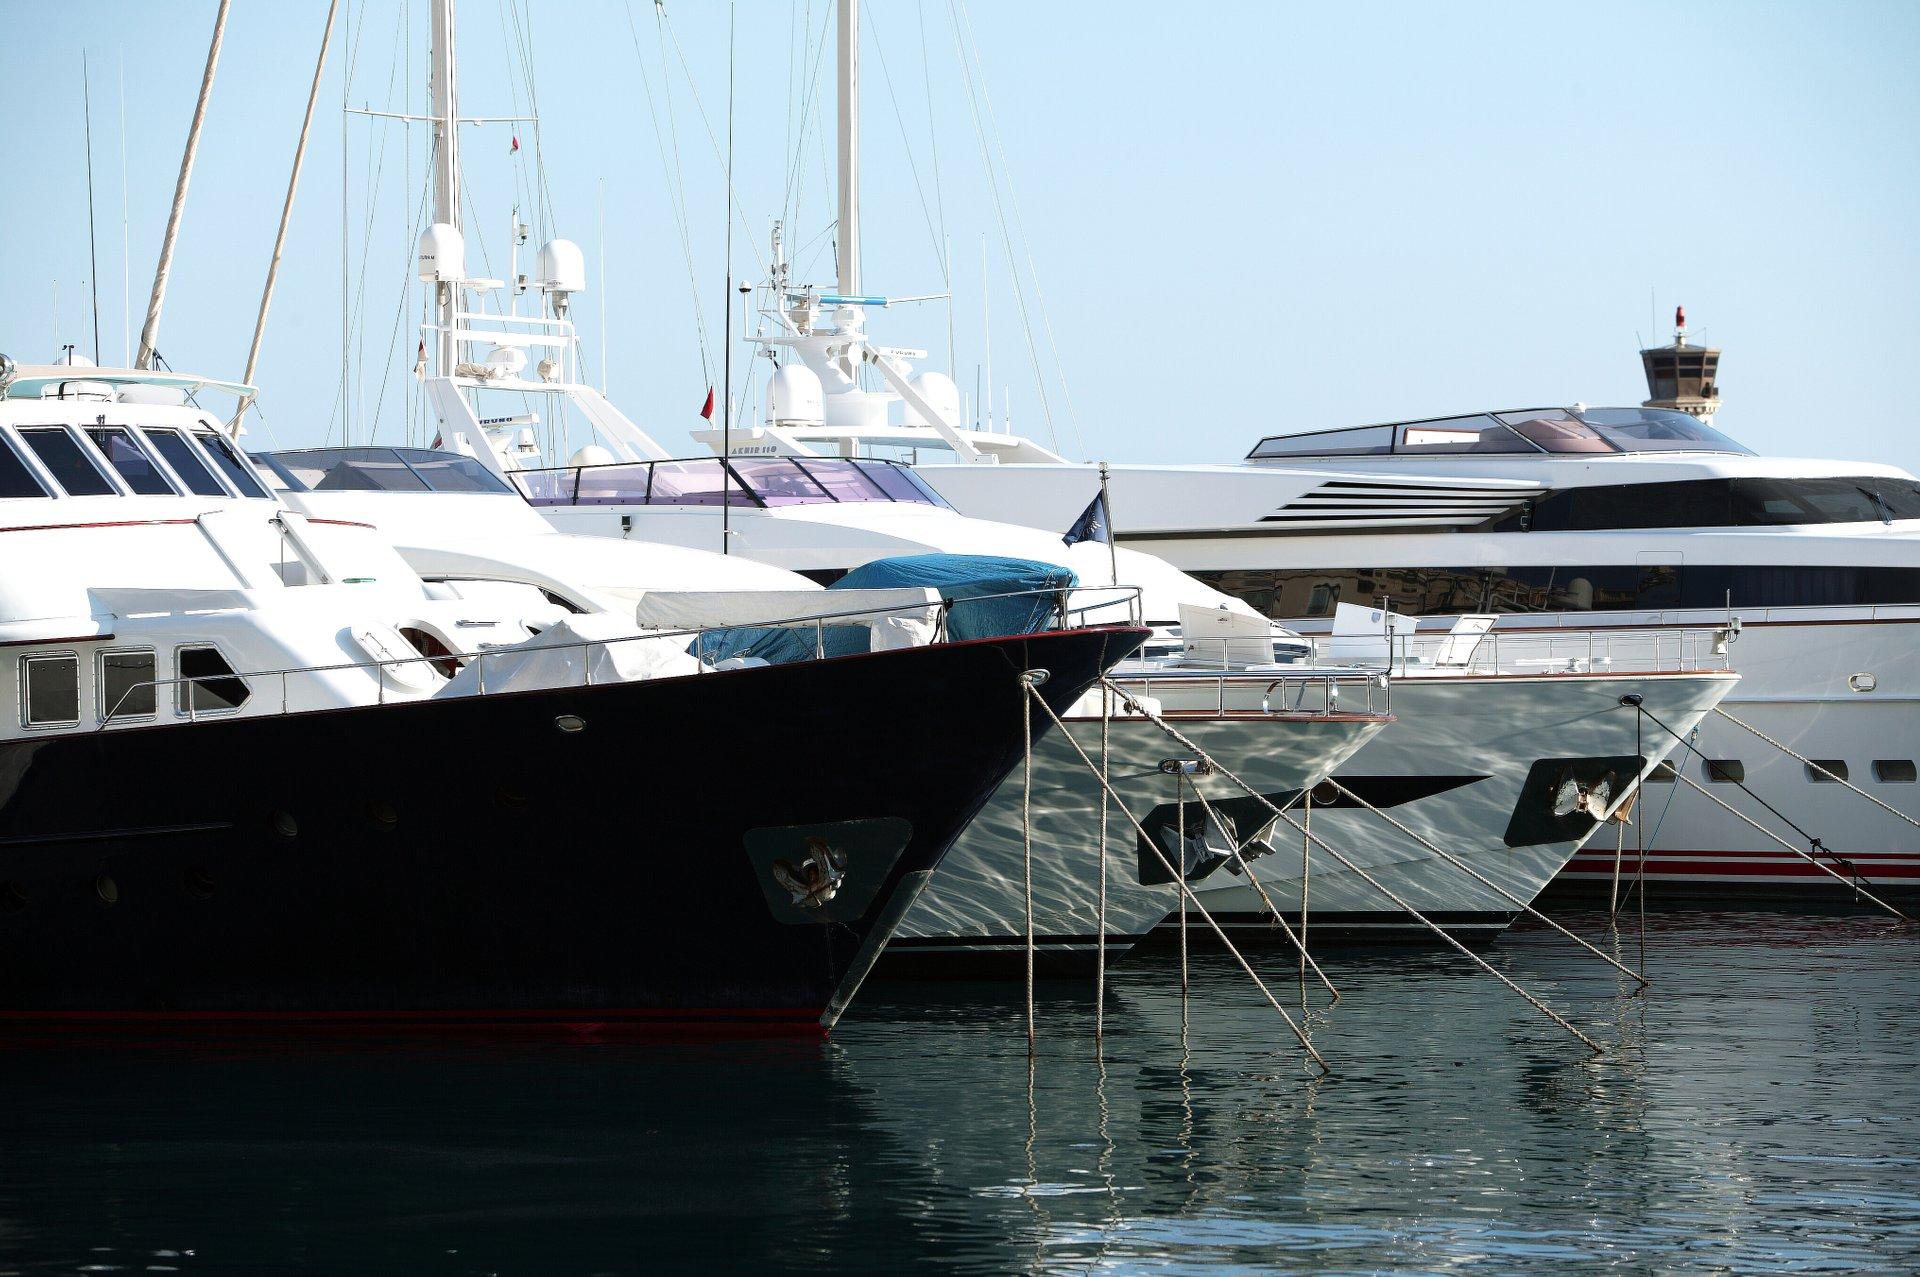 Sailing Season in Monaco - Best Season 2020